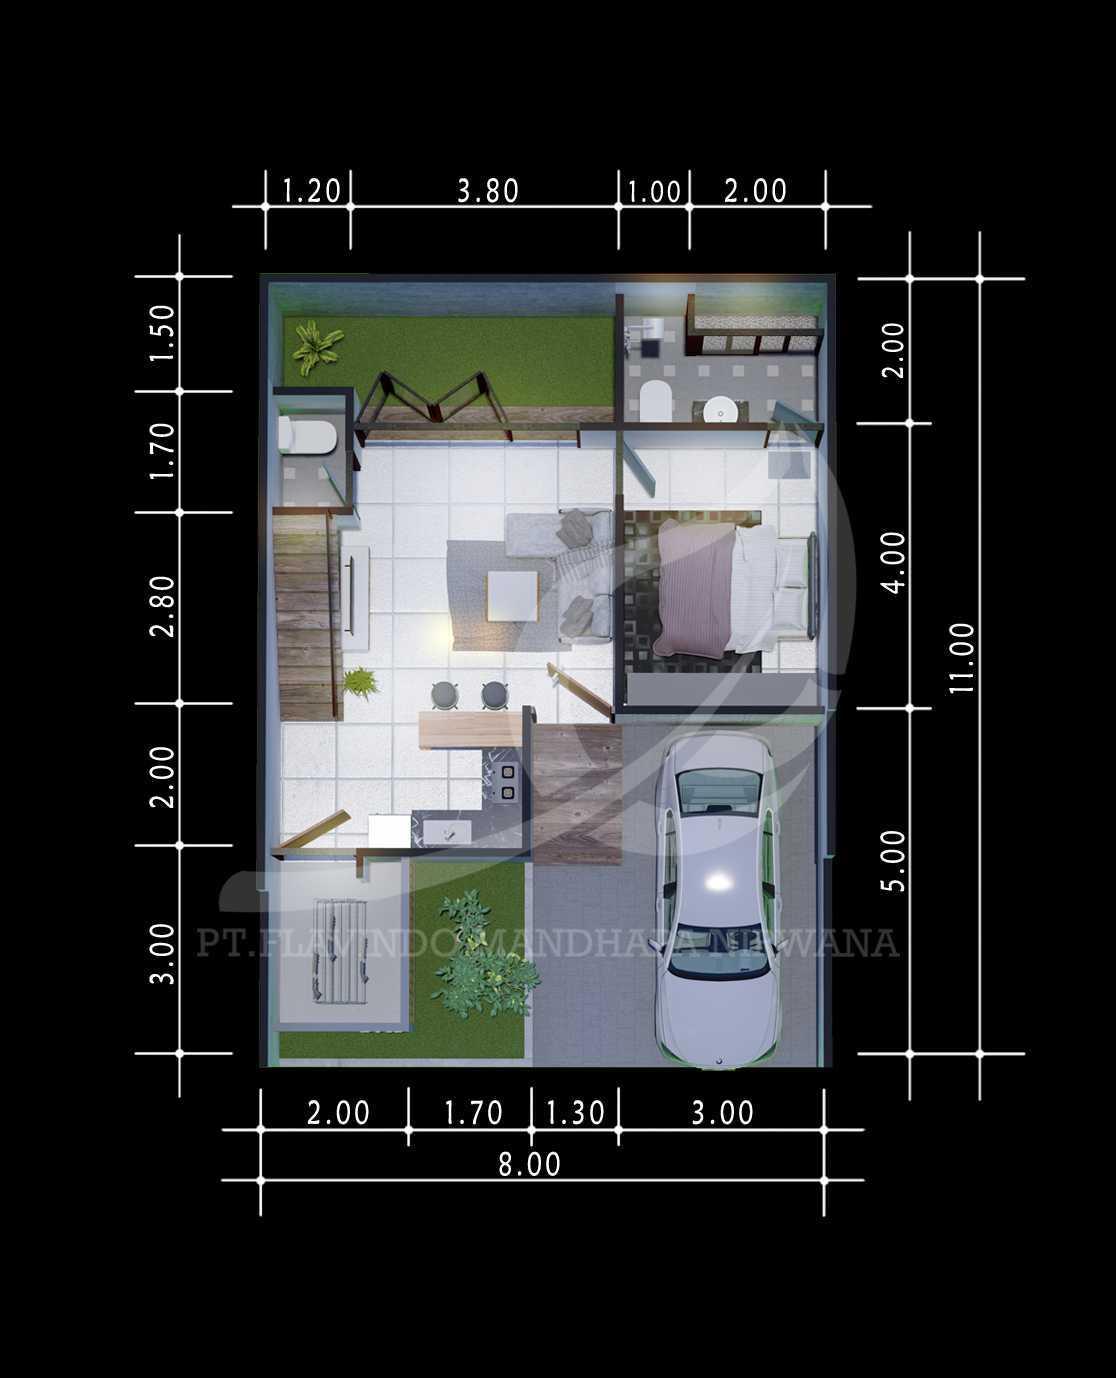 Flav Arsitek Mr. Syahrowardi House Malang, Kota Malang, Jawa Timur, Indonesia Malang, Kota Malang, Jawa Timur, Indonesia Flav-Arsitek-Mr-Syahrowardi-Detailed-Project-Gallery  112309